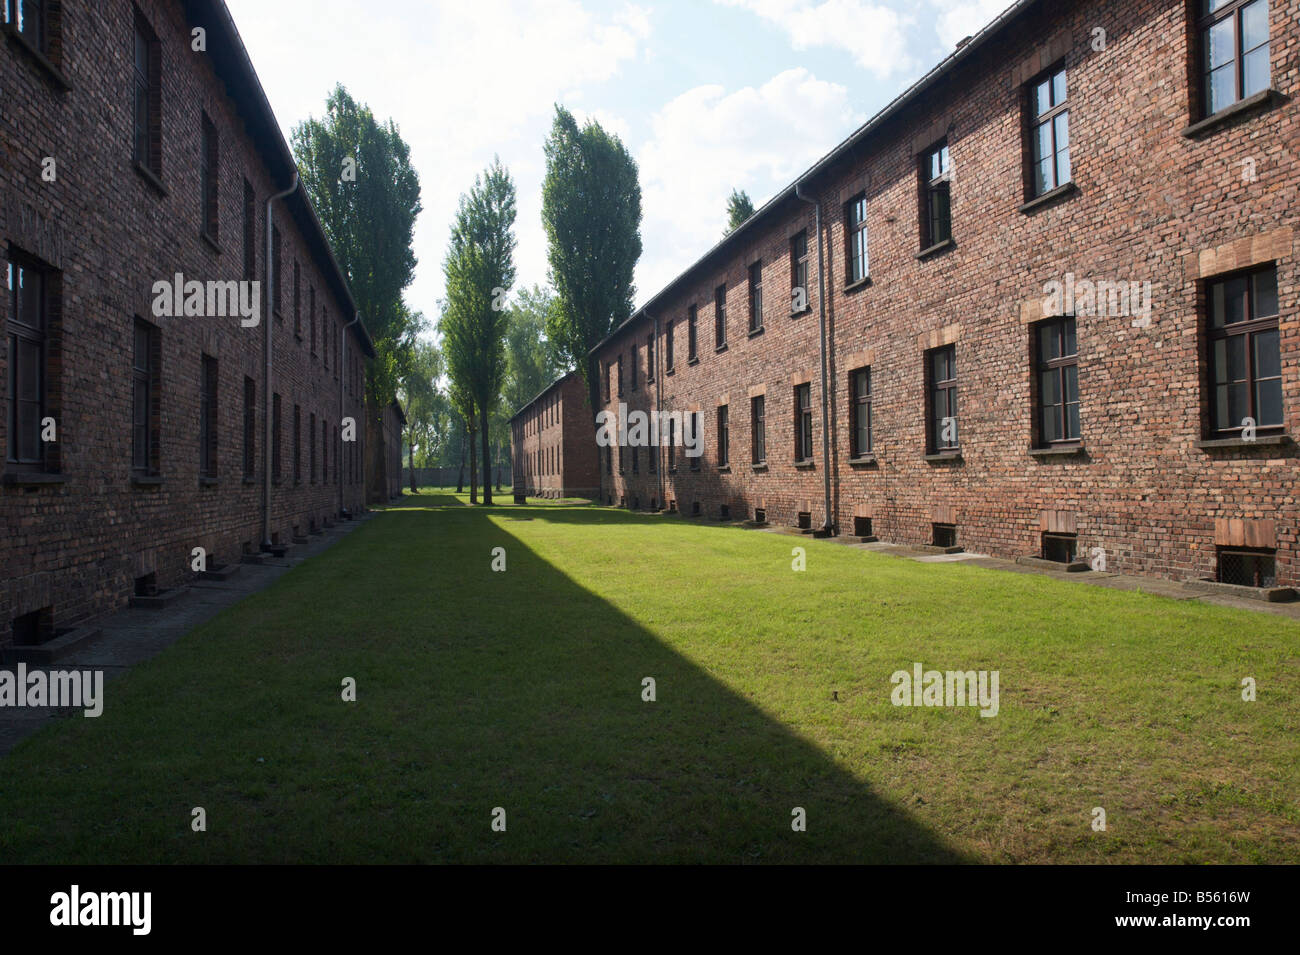 Nazi Tourism: Third Reich Architecture You Can Still Visit ... |Concentration Camps Buildings